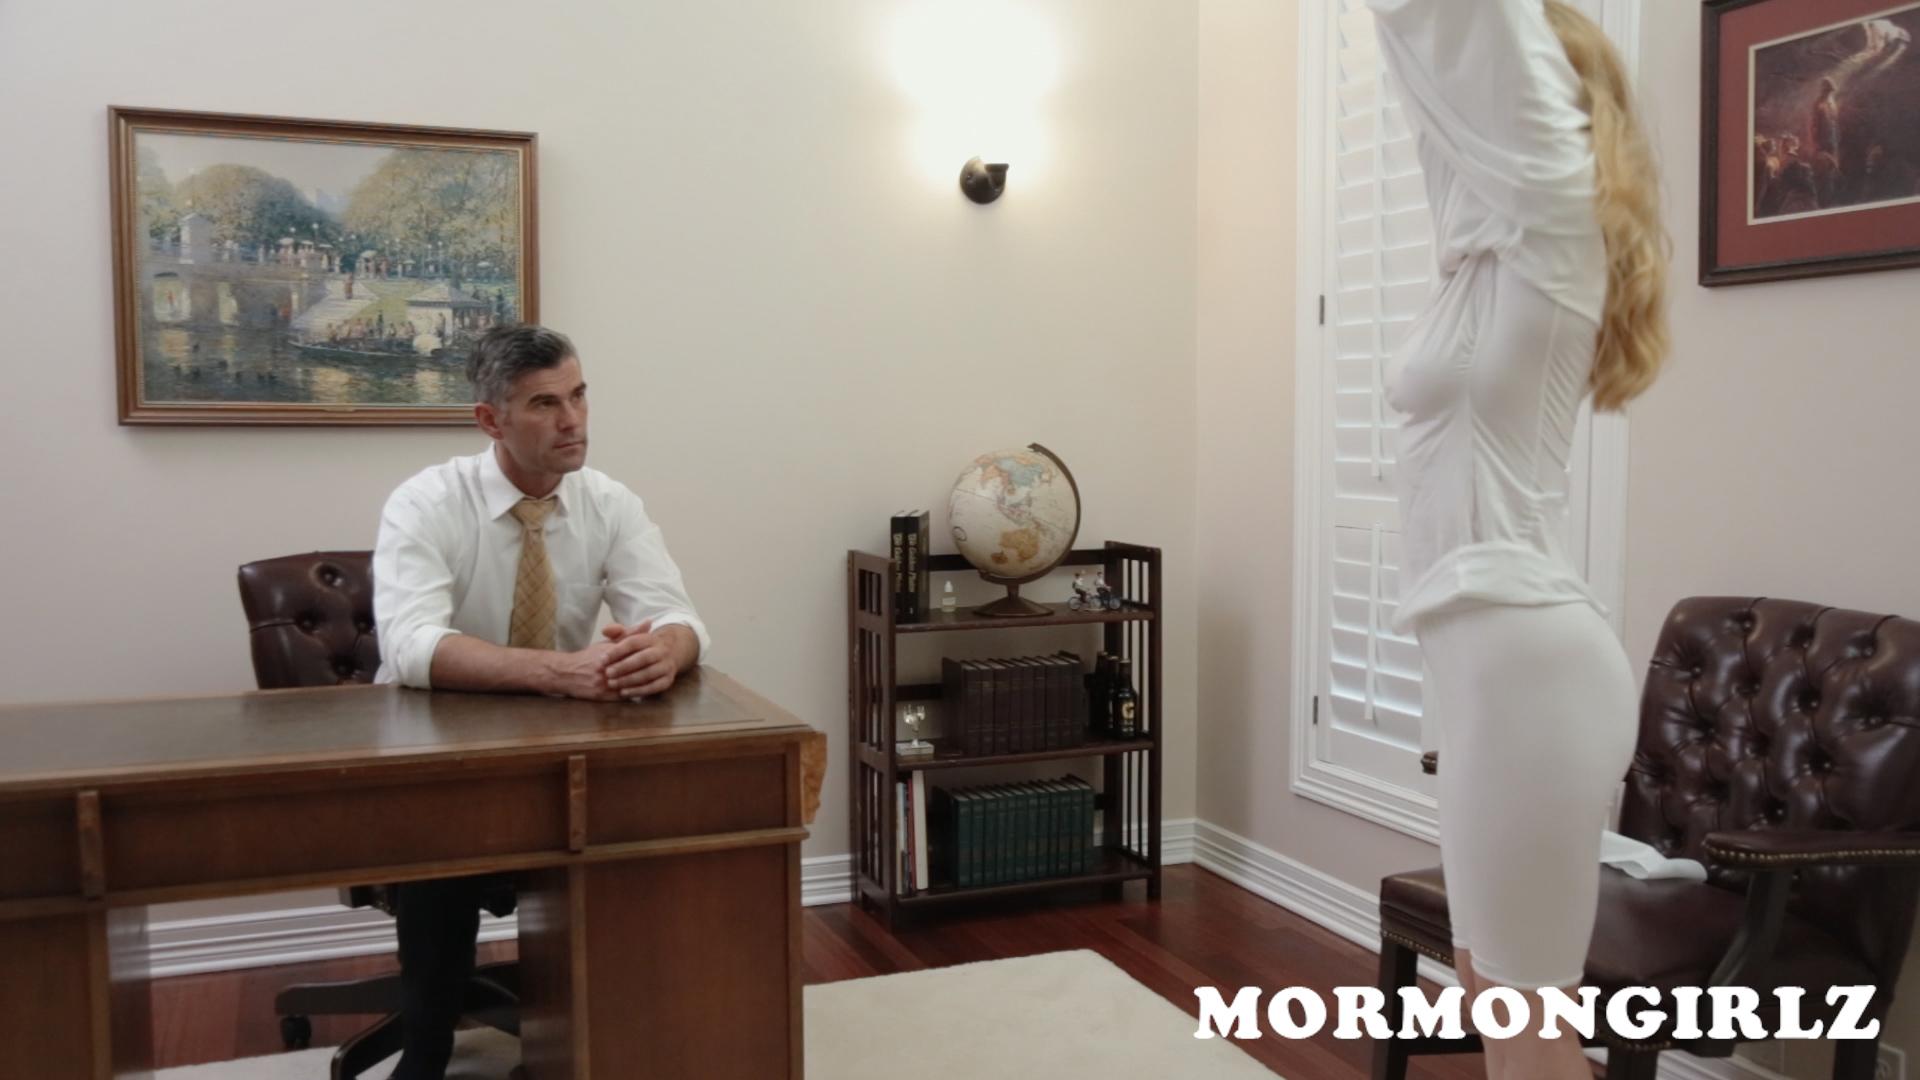 mormongirlz_70b_03